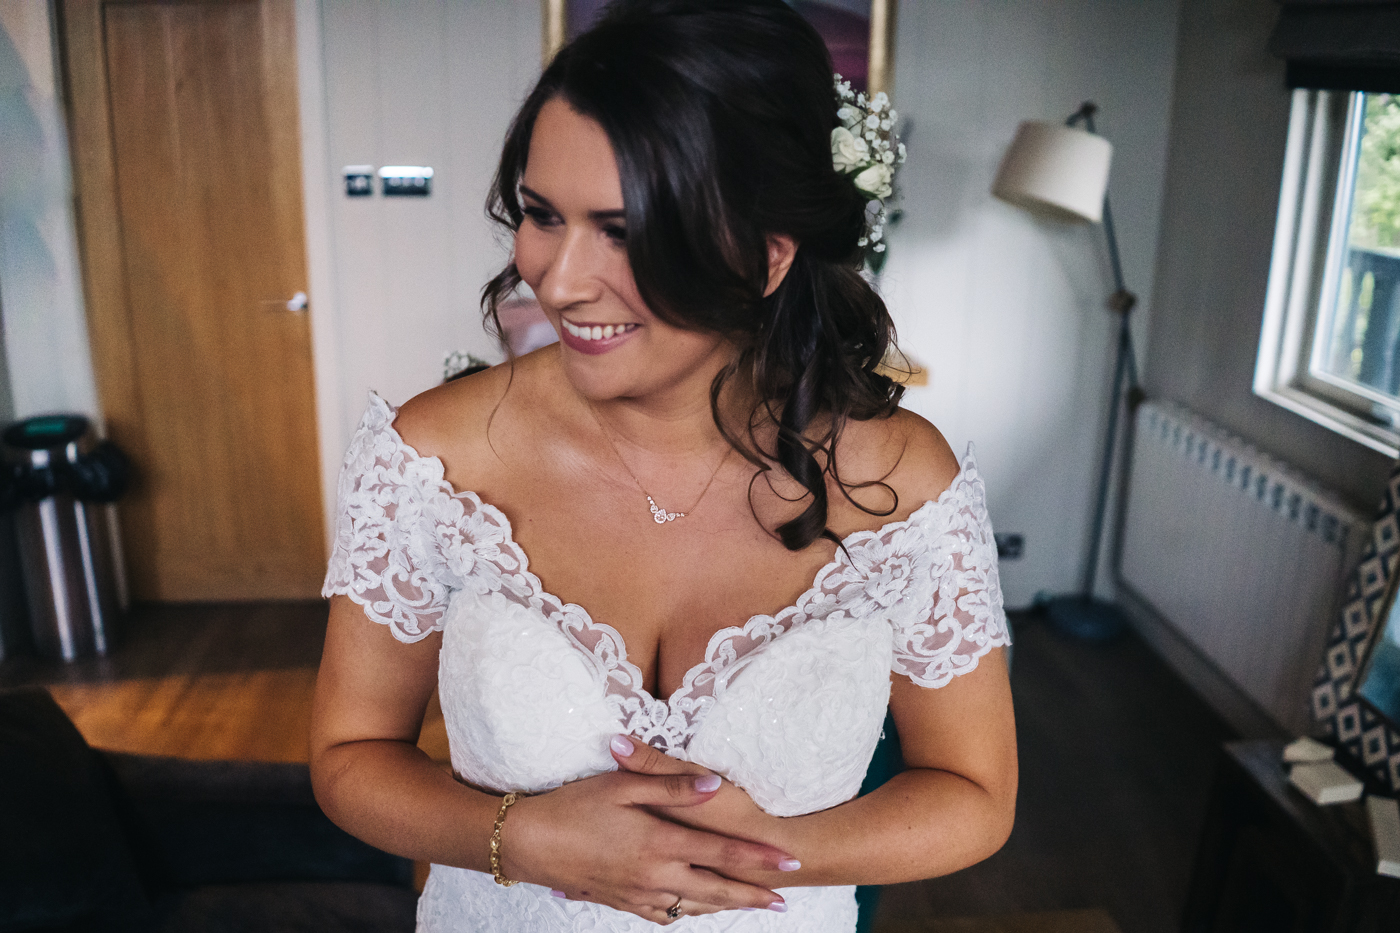 scottish-wedding-trossachs-loch-tay-highlannds-relaxed-photography-photographer-0006.jpg